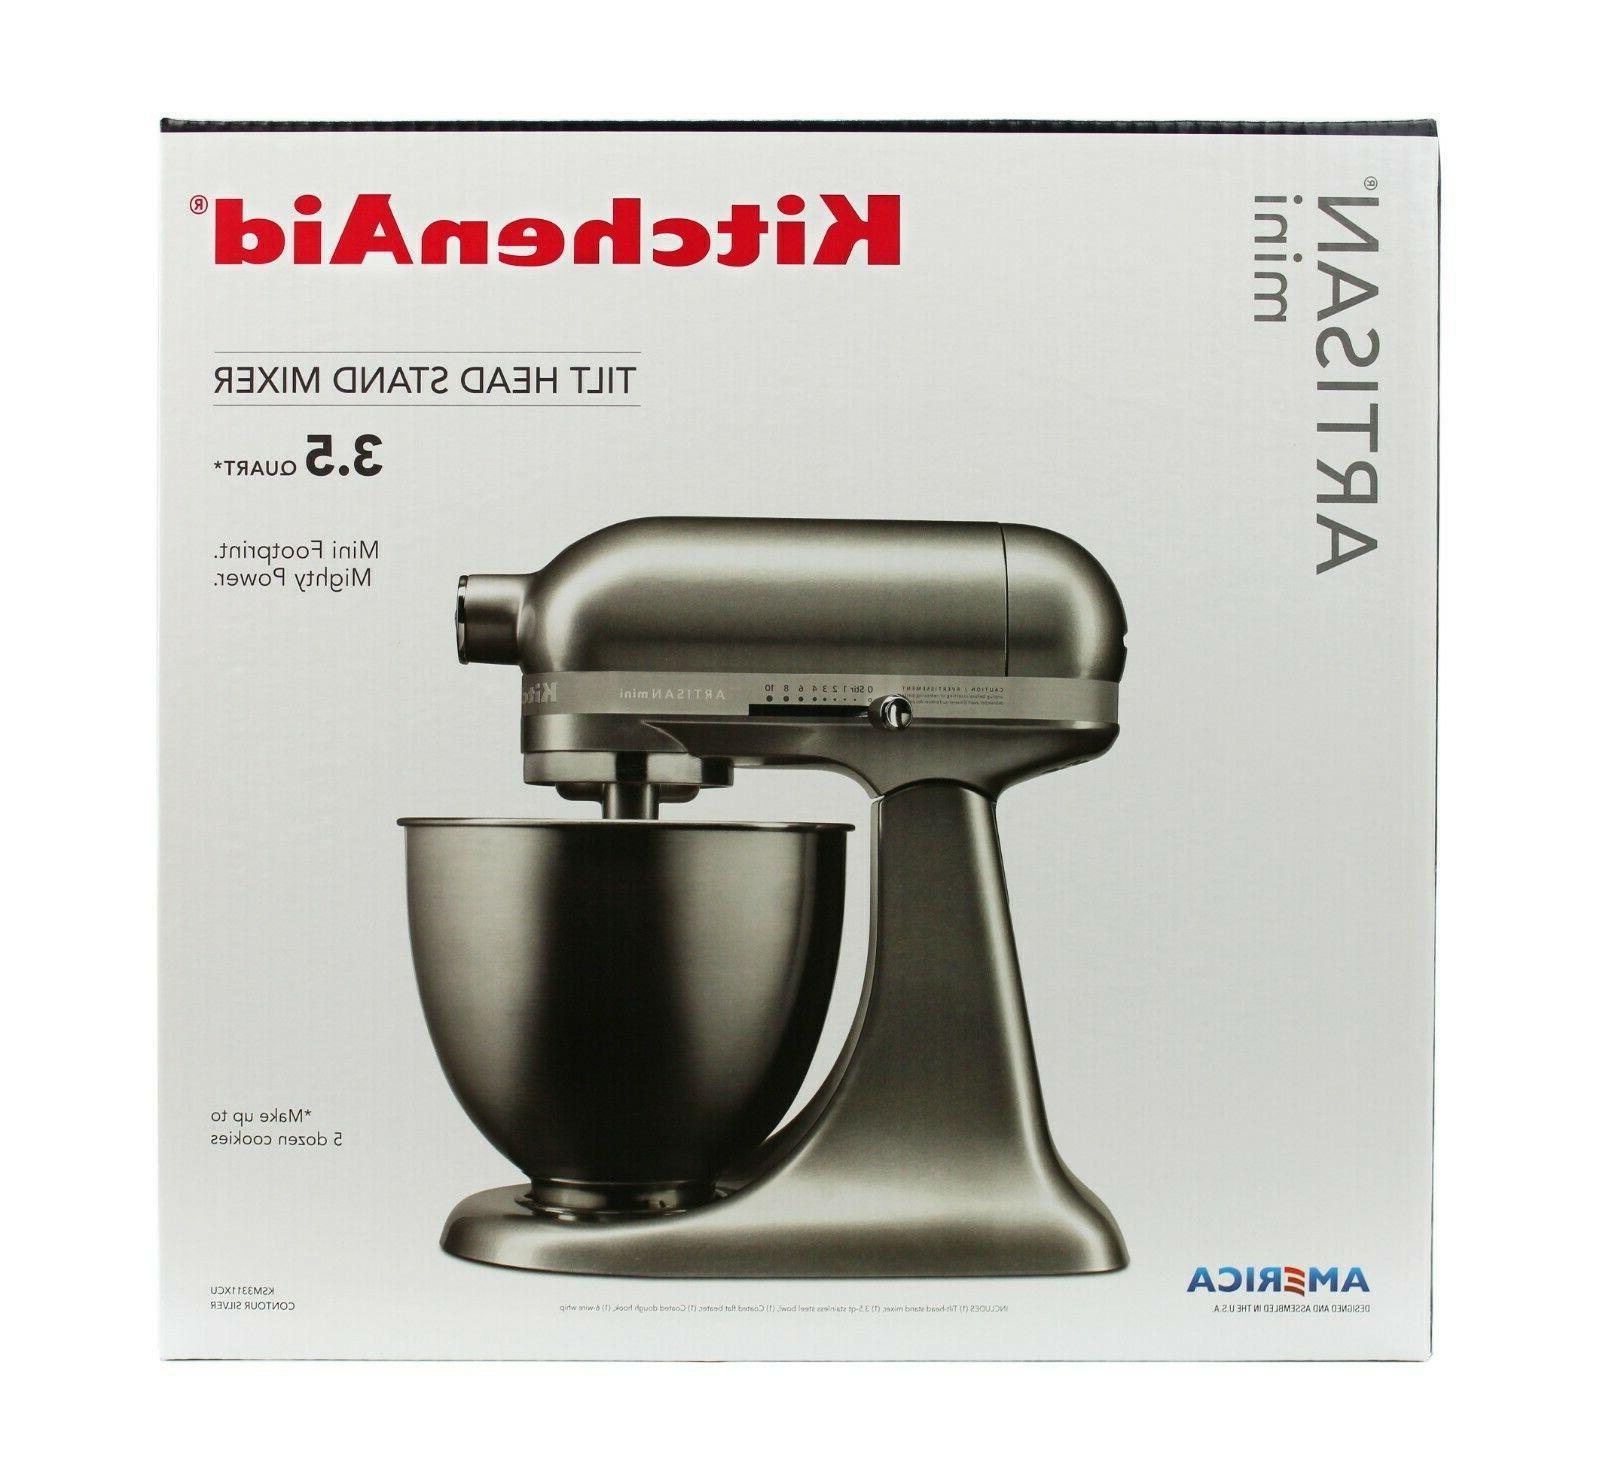 KitchenAid KSM150PSCU Tilt Head Stand Mixer Silver SHIP